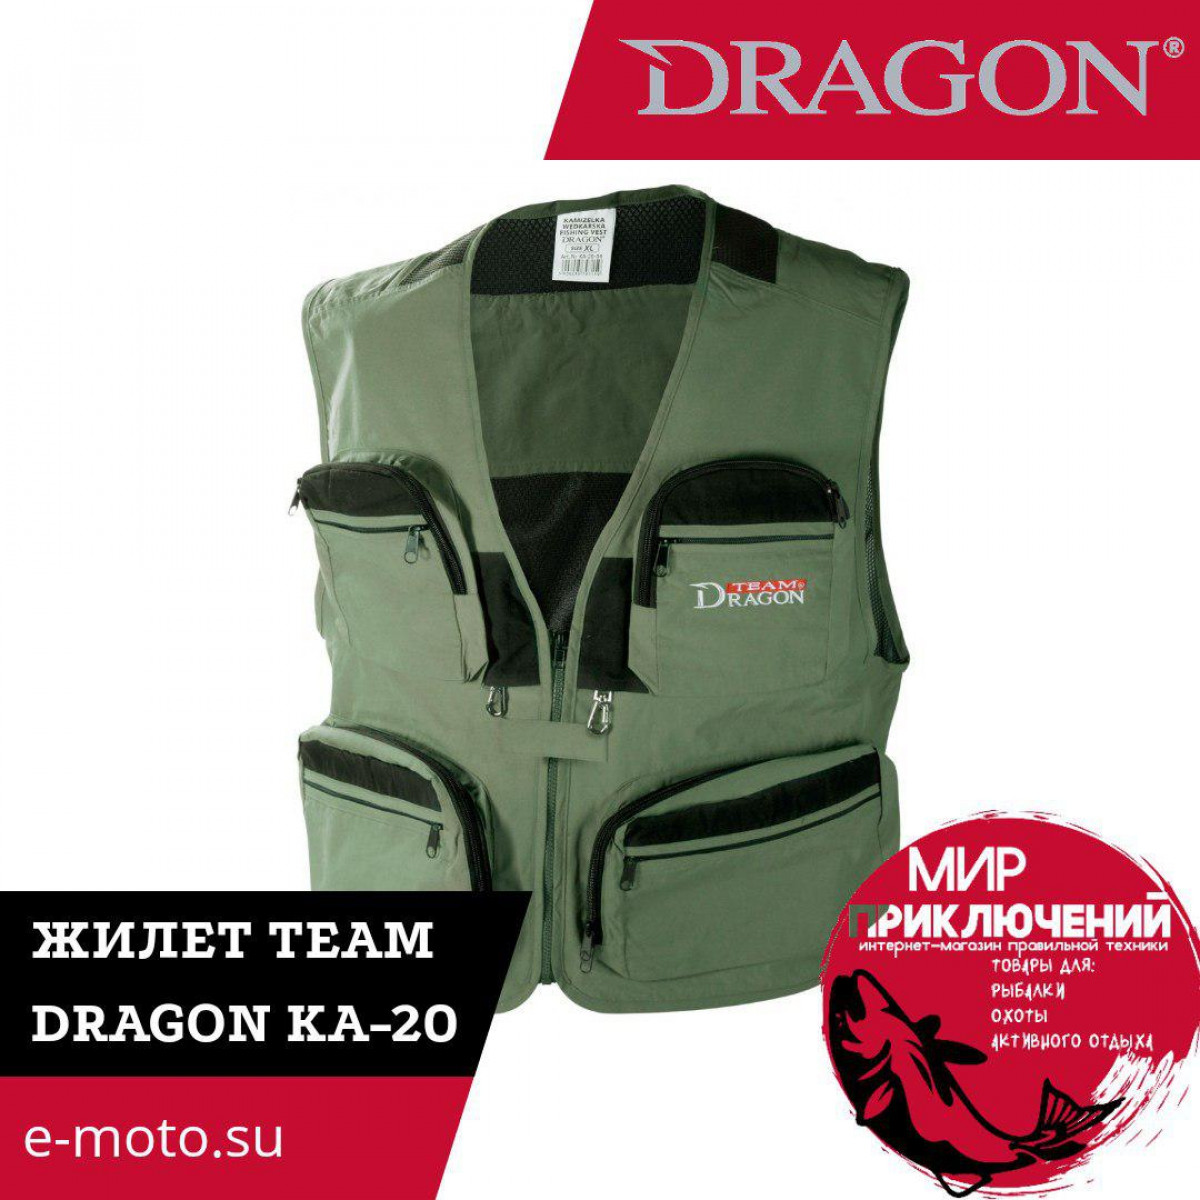 Жилет Team Dragon KA-20